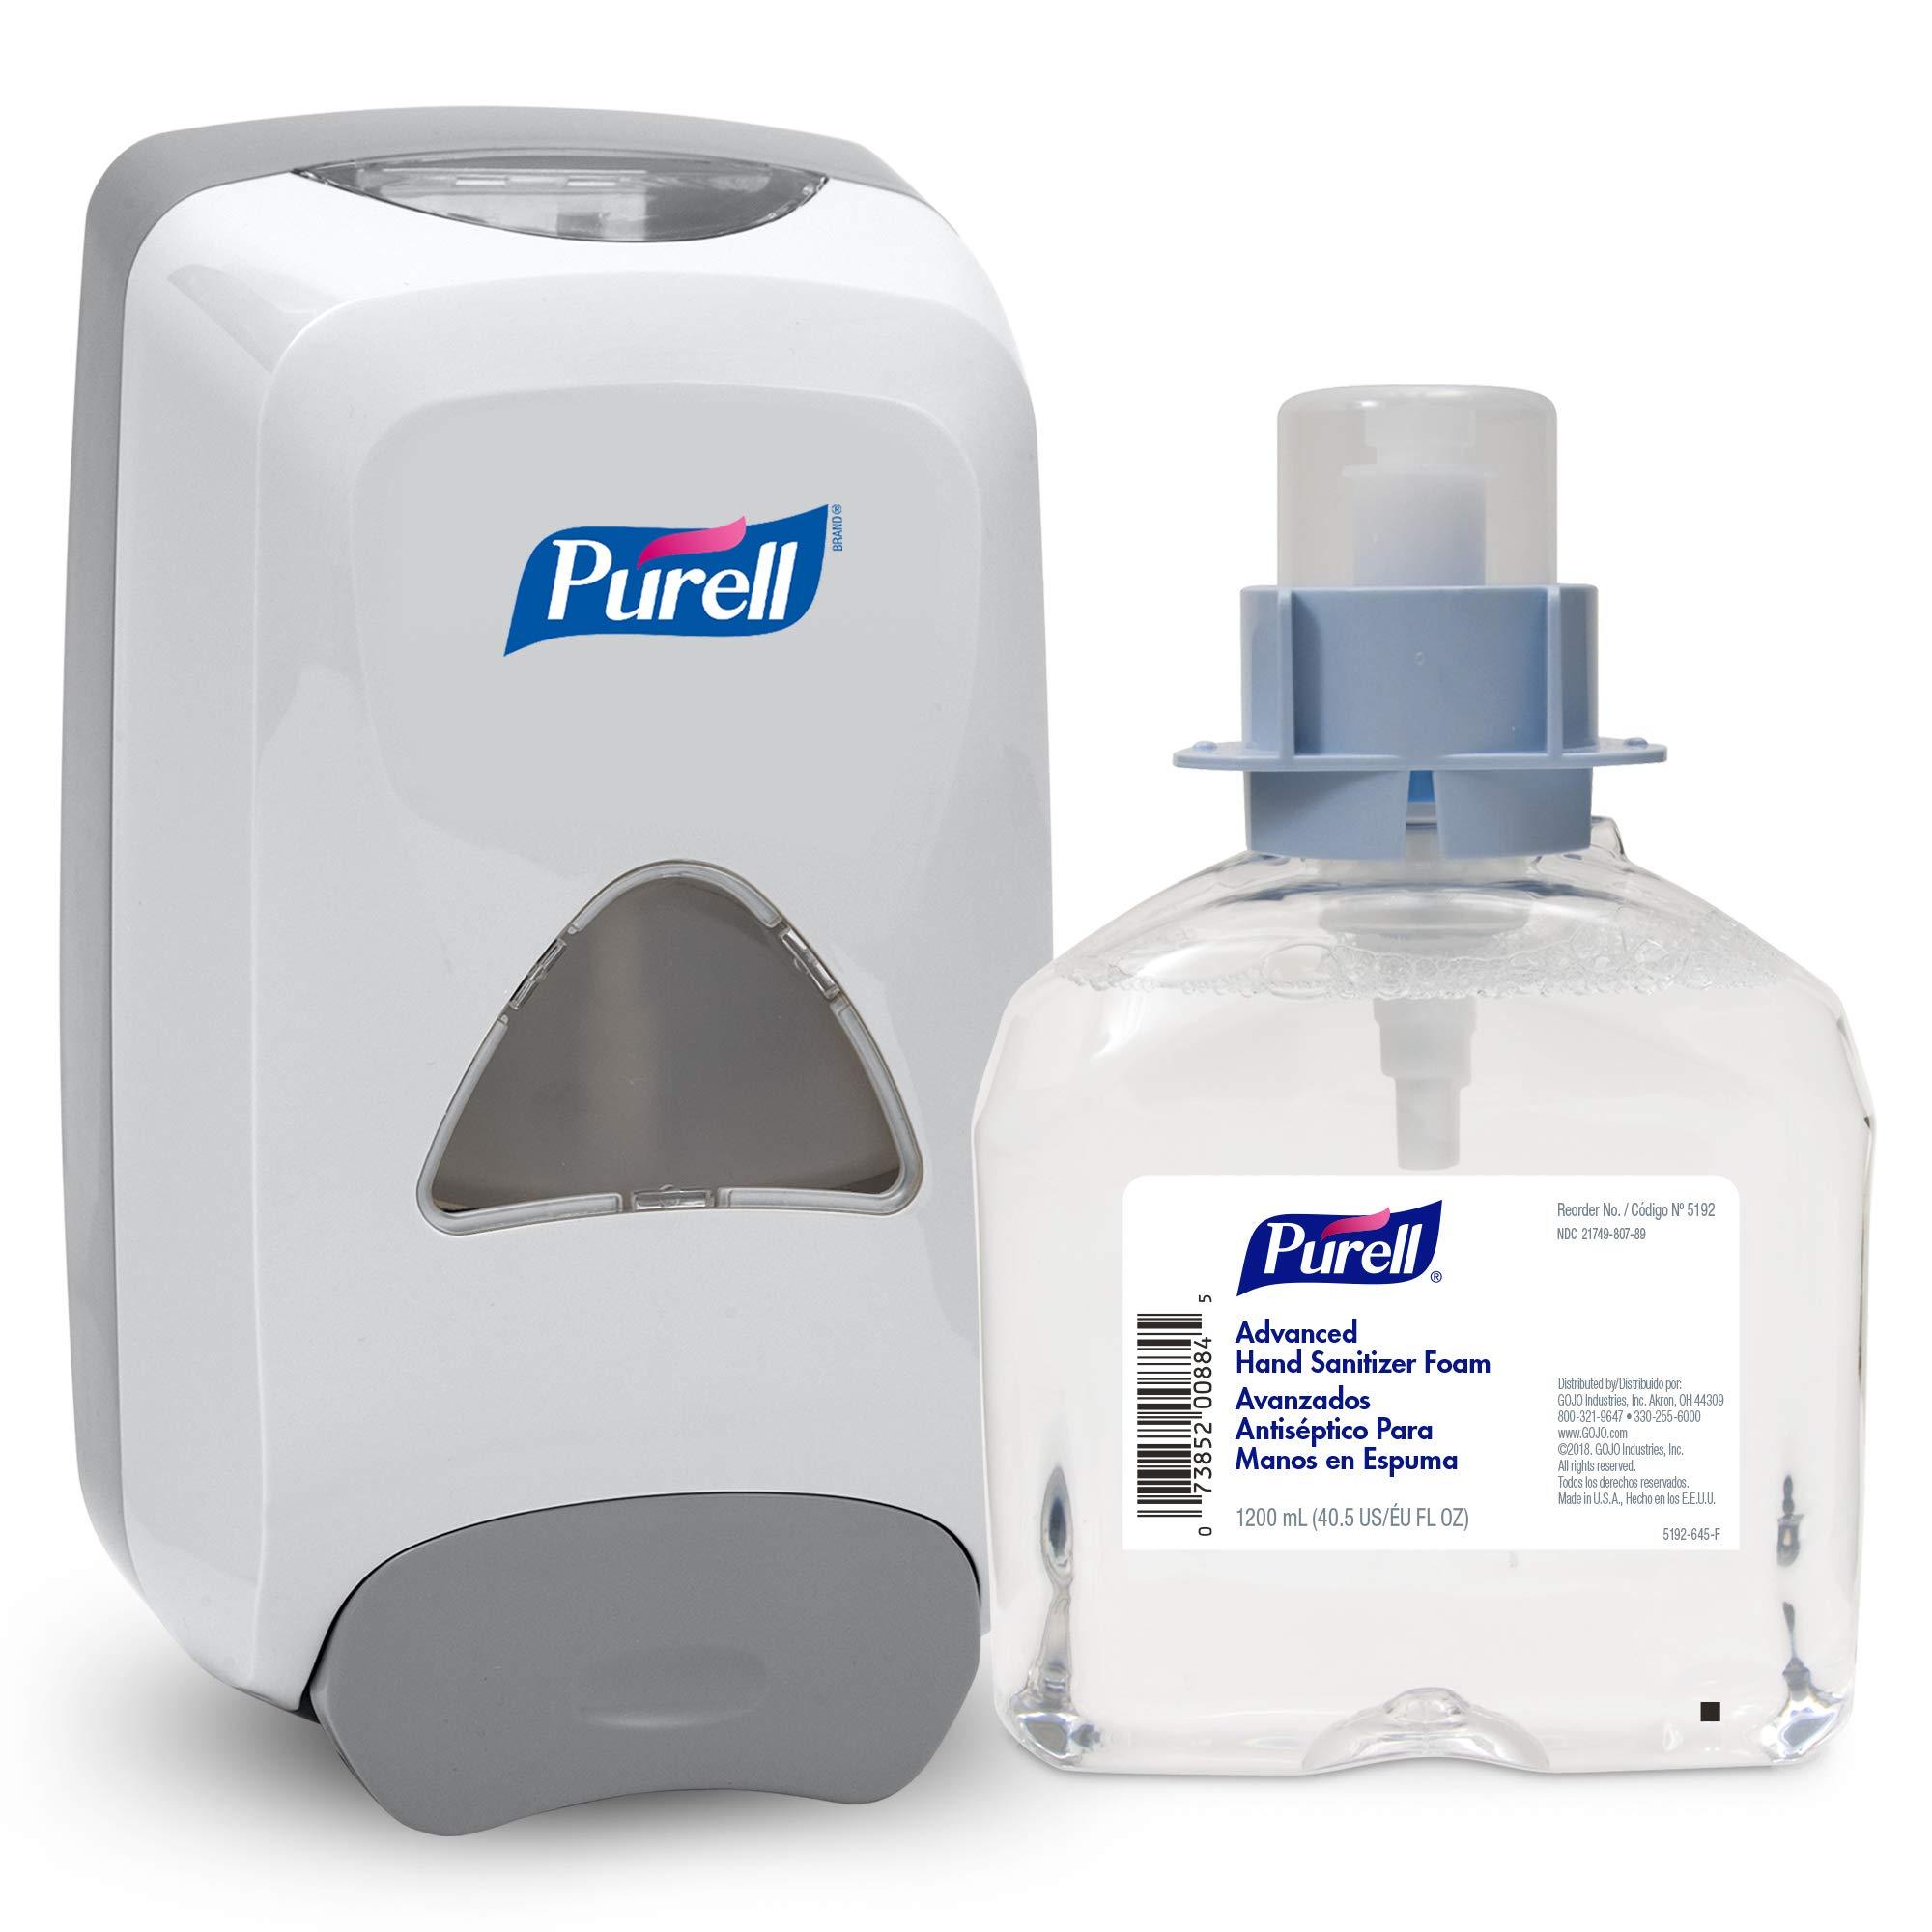 PURELL Advanced Hand Sanitizer Foam FMX-12 Starter Kit, 1-1200mL Advanced Hand Sanitizer Foam Refill + 1 - PURELLFMX-12Dove Grey Push-Style Dispenser - 5192-D1 by Purell